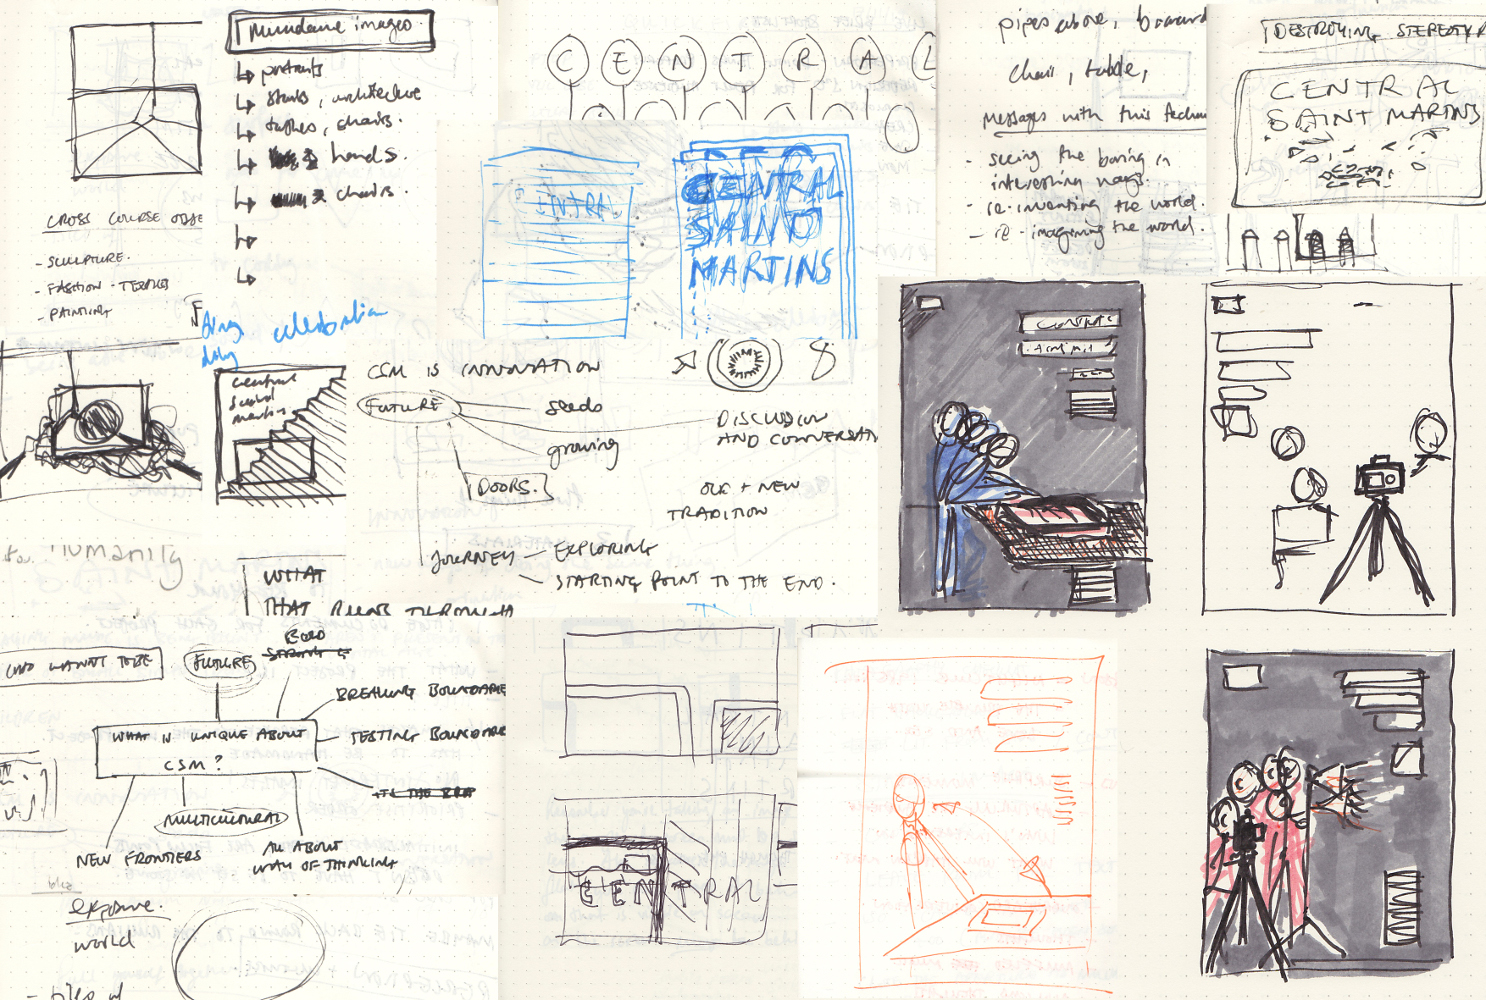 Stefan and Nikita's preliminary sketches.